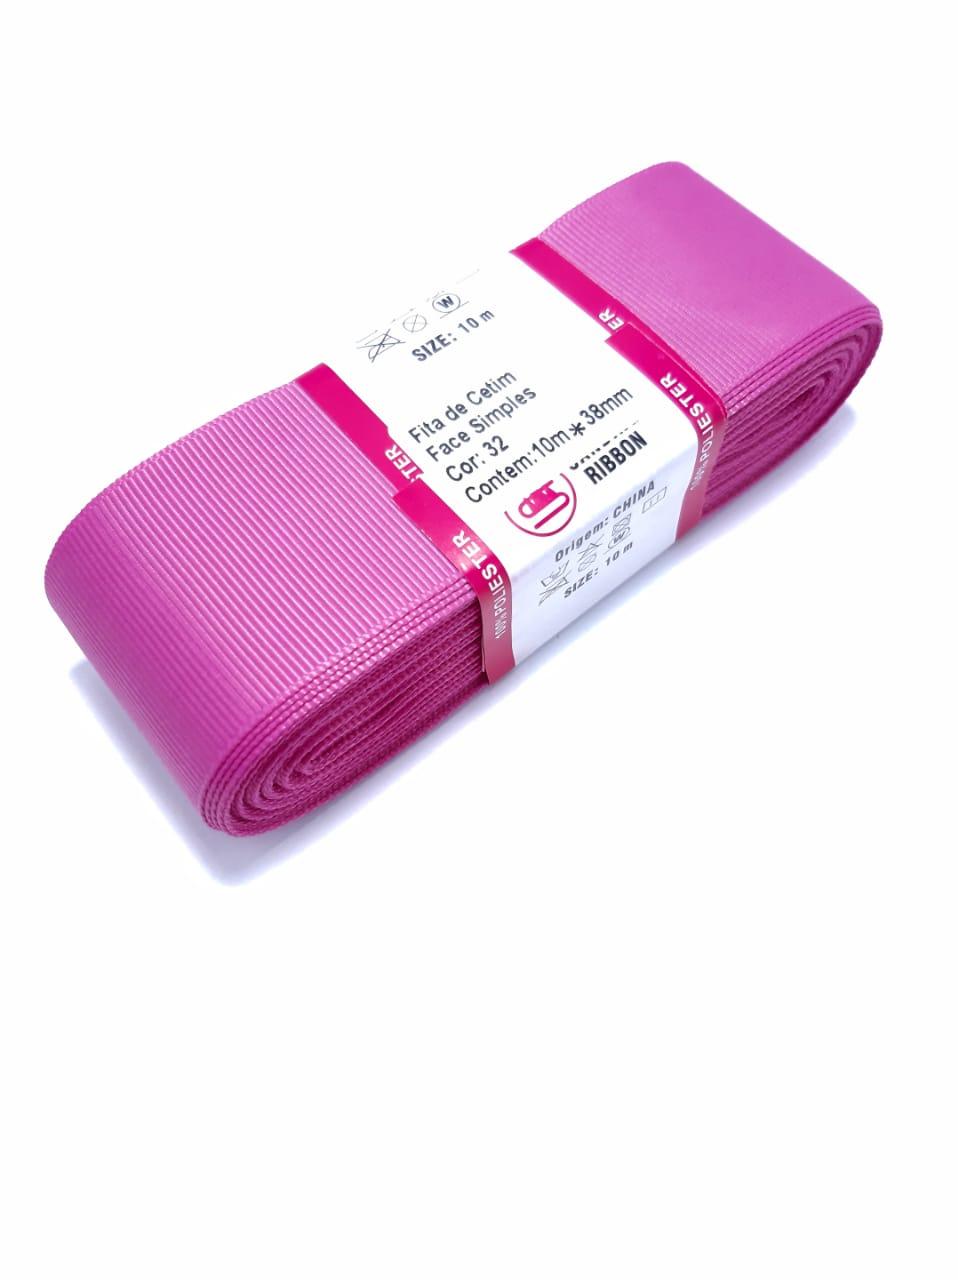 FITA SANDING 38 mm - Cor: 032 Rose Pink.